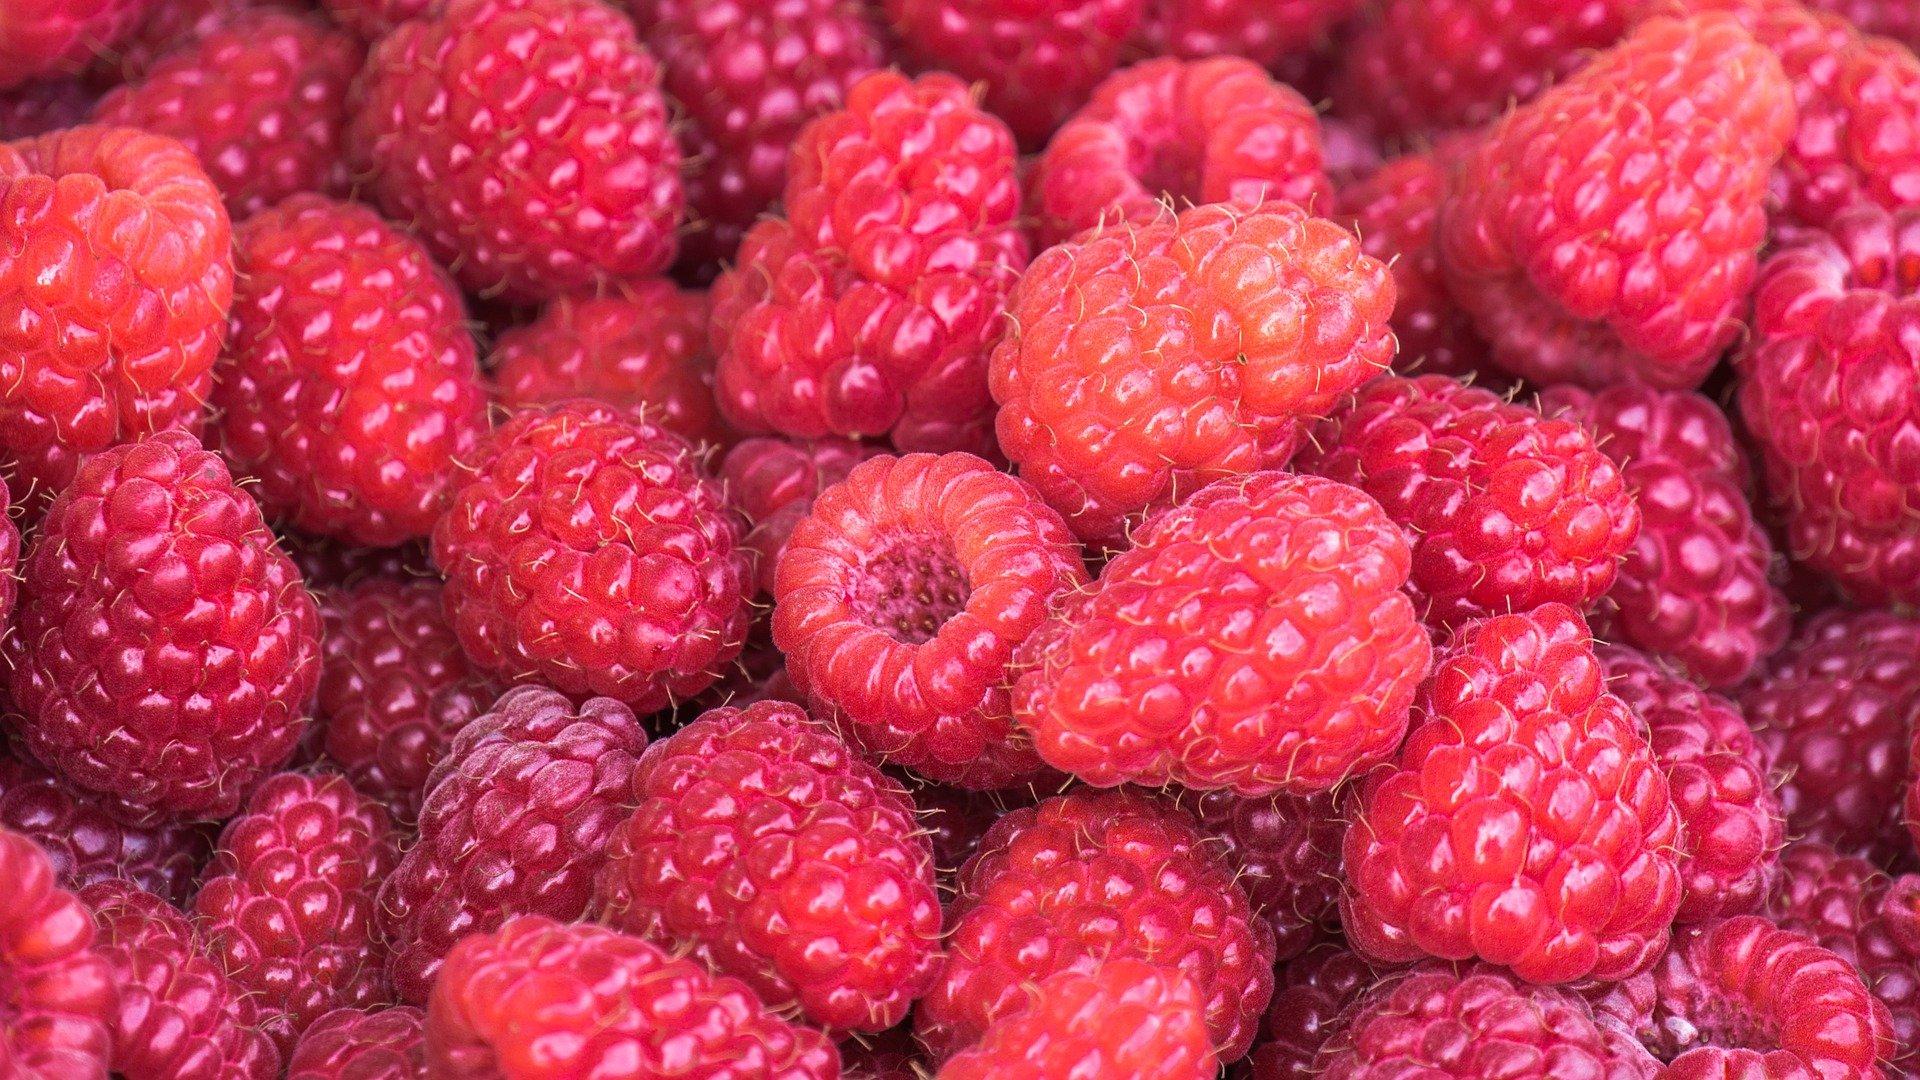 raspberries 3583005 1920